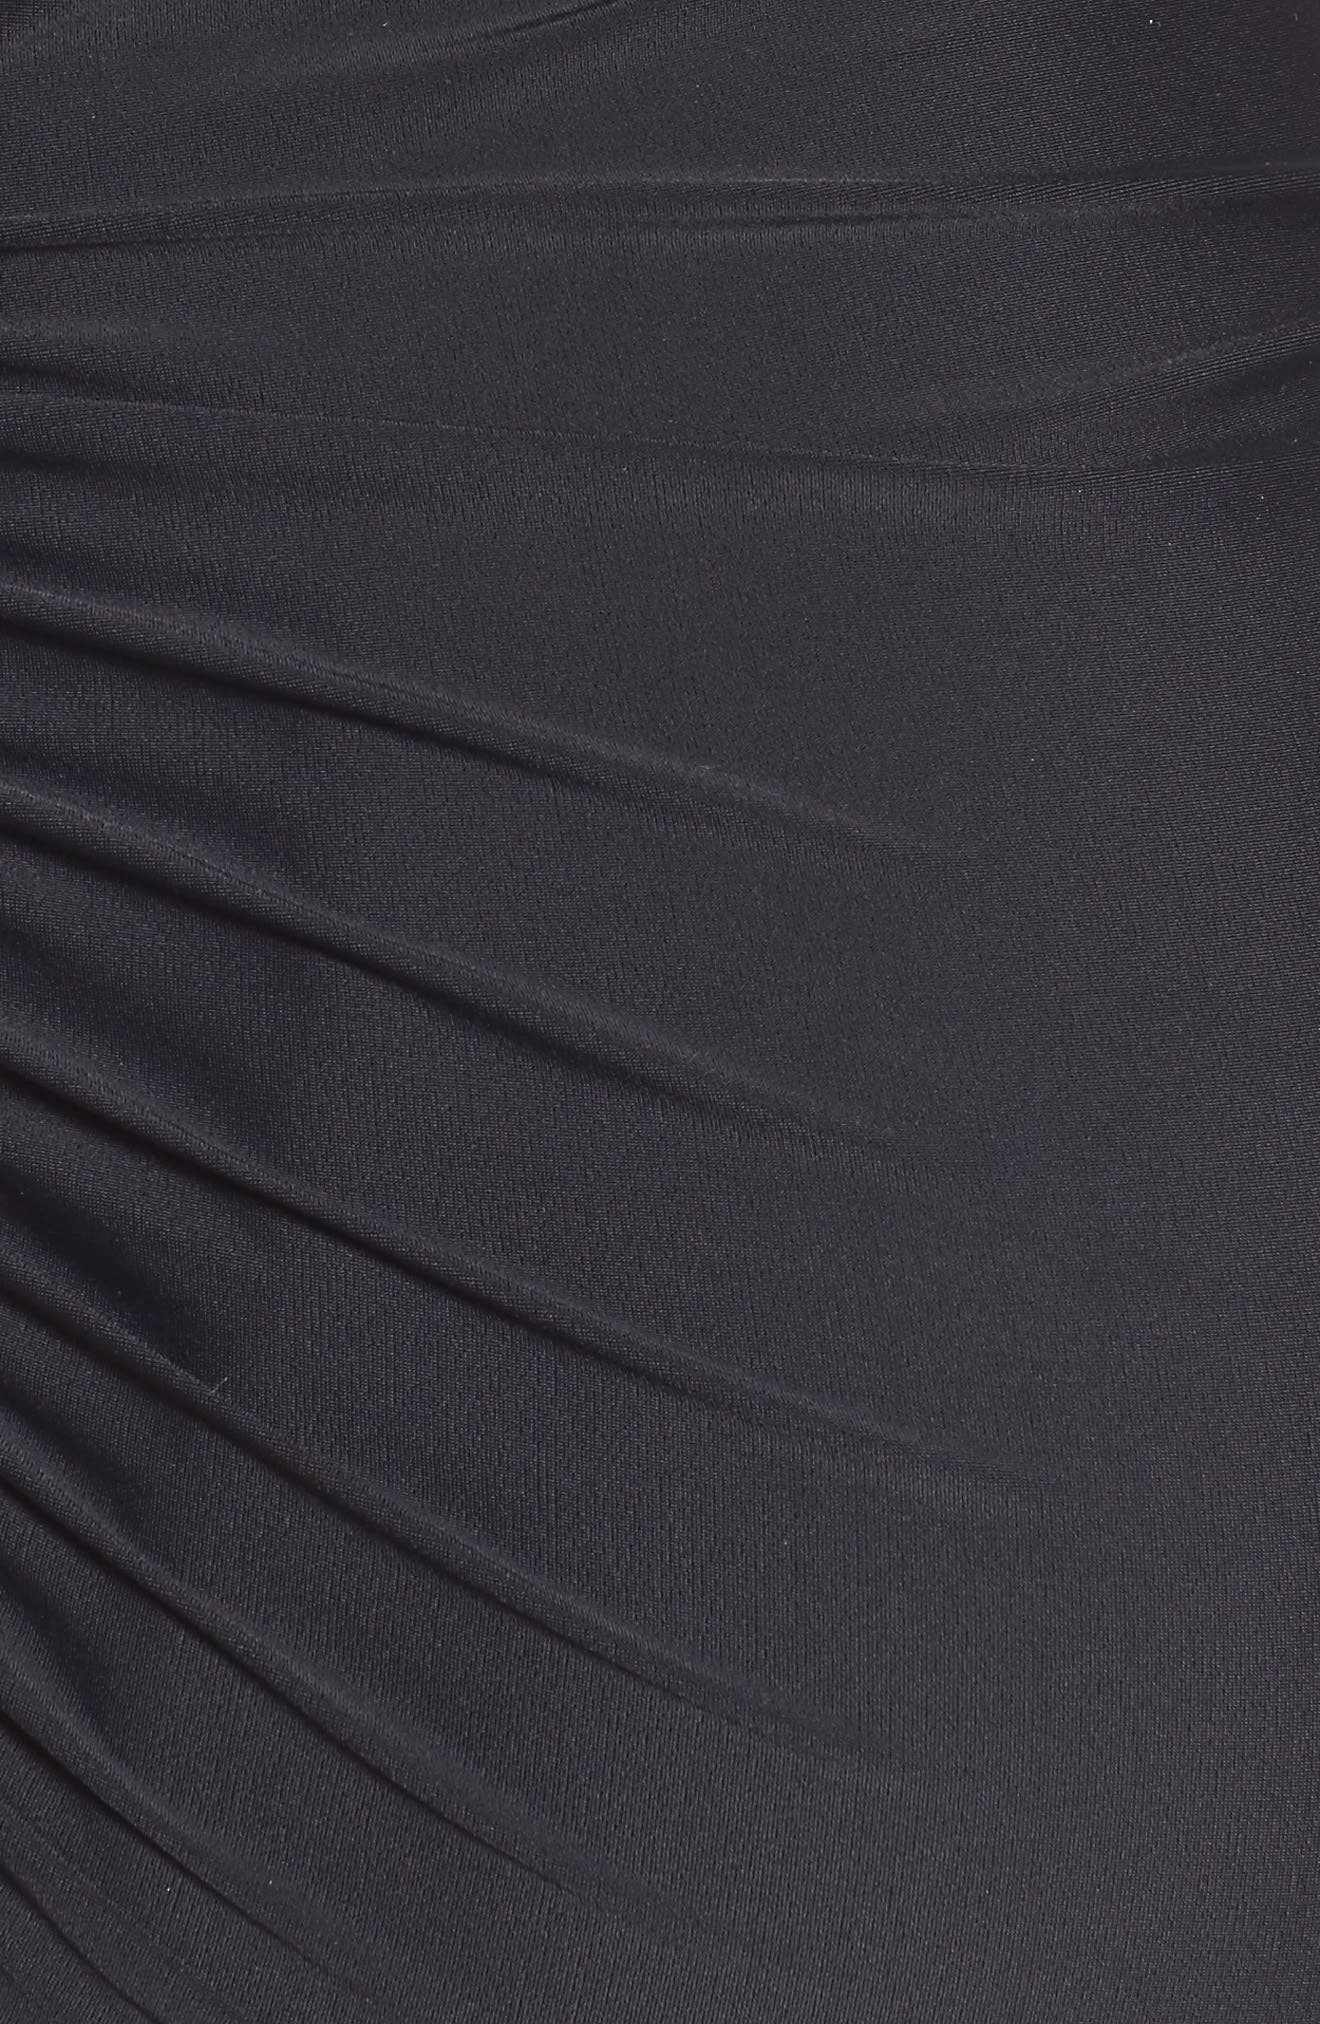 MATERNAL AMERICA, Ruched Maternity Tankini Swimsuit, Alternate thumbnail 6, color, BLACK